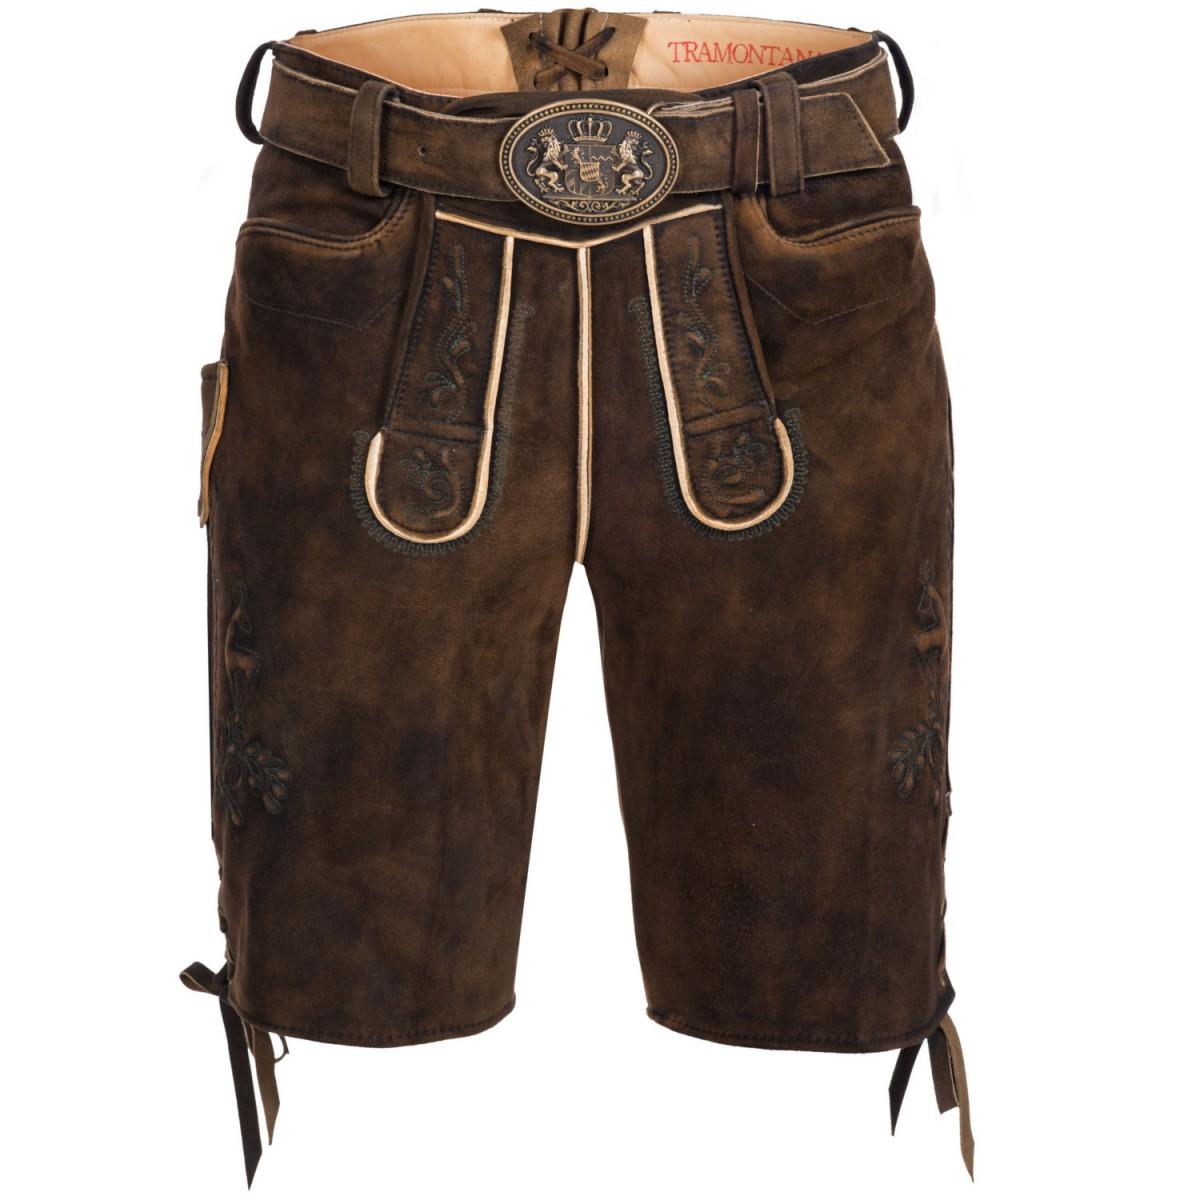 Kurze lederhose in dunkelbraun von tramontana ebay for Trachten finest